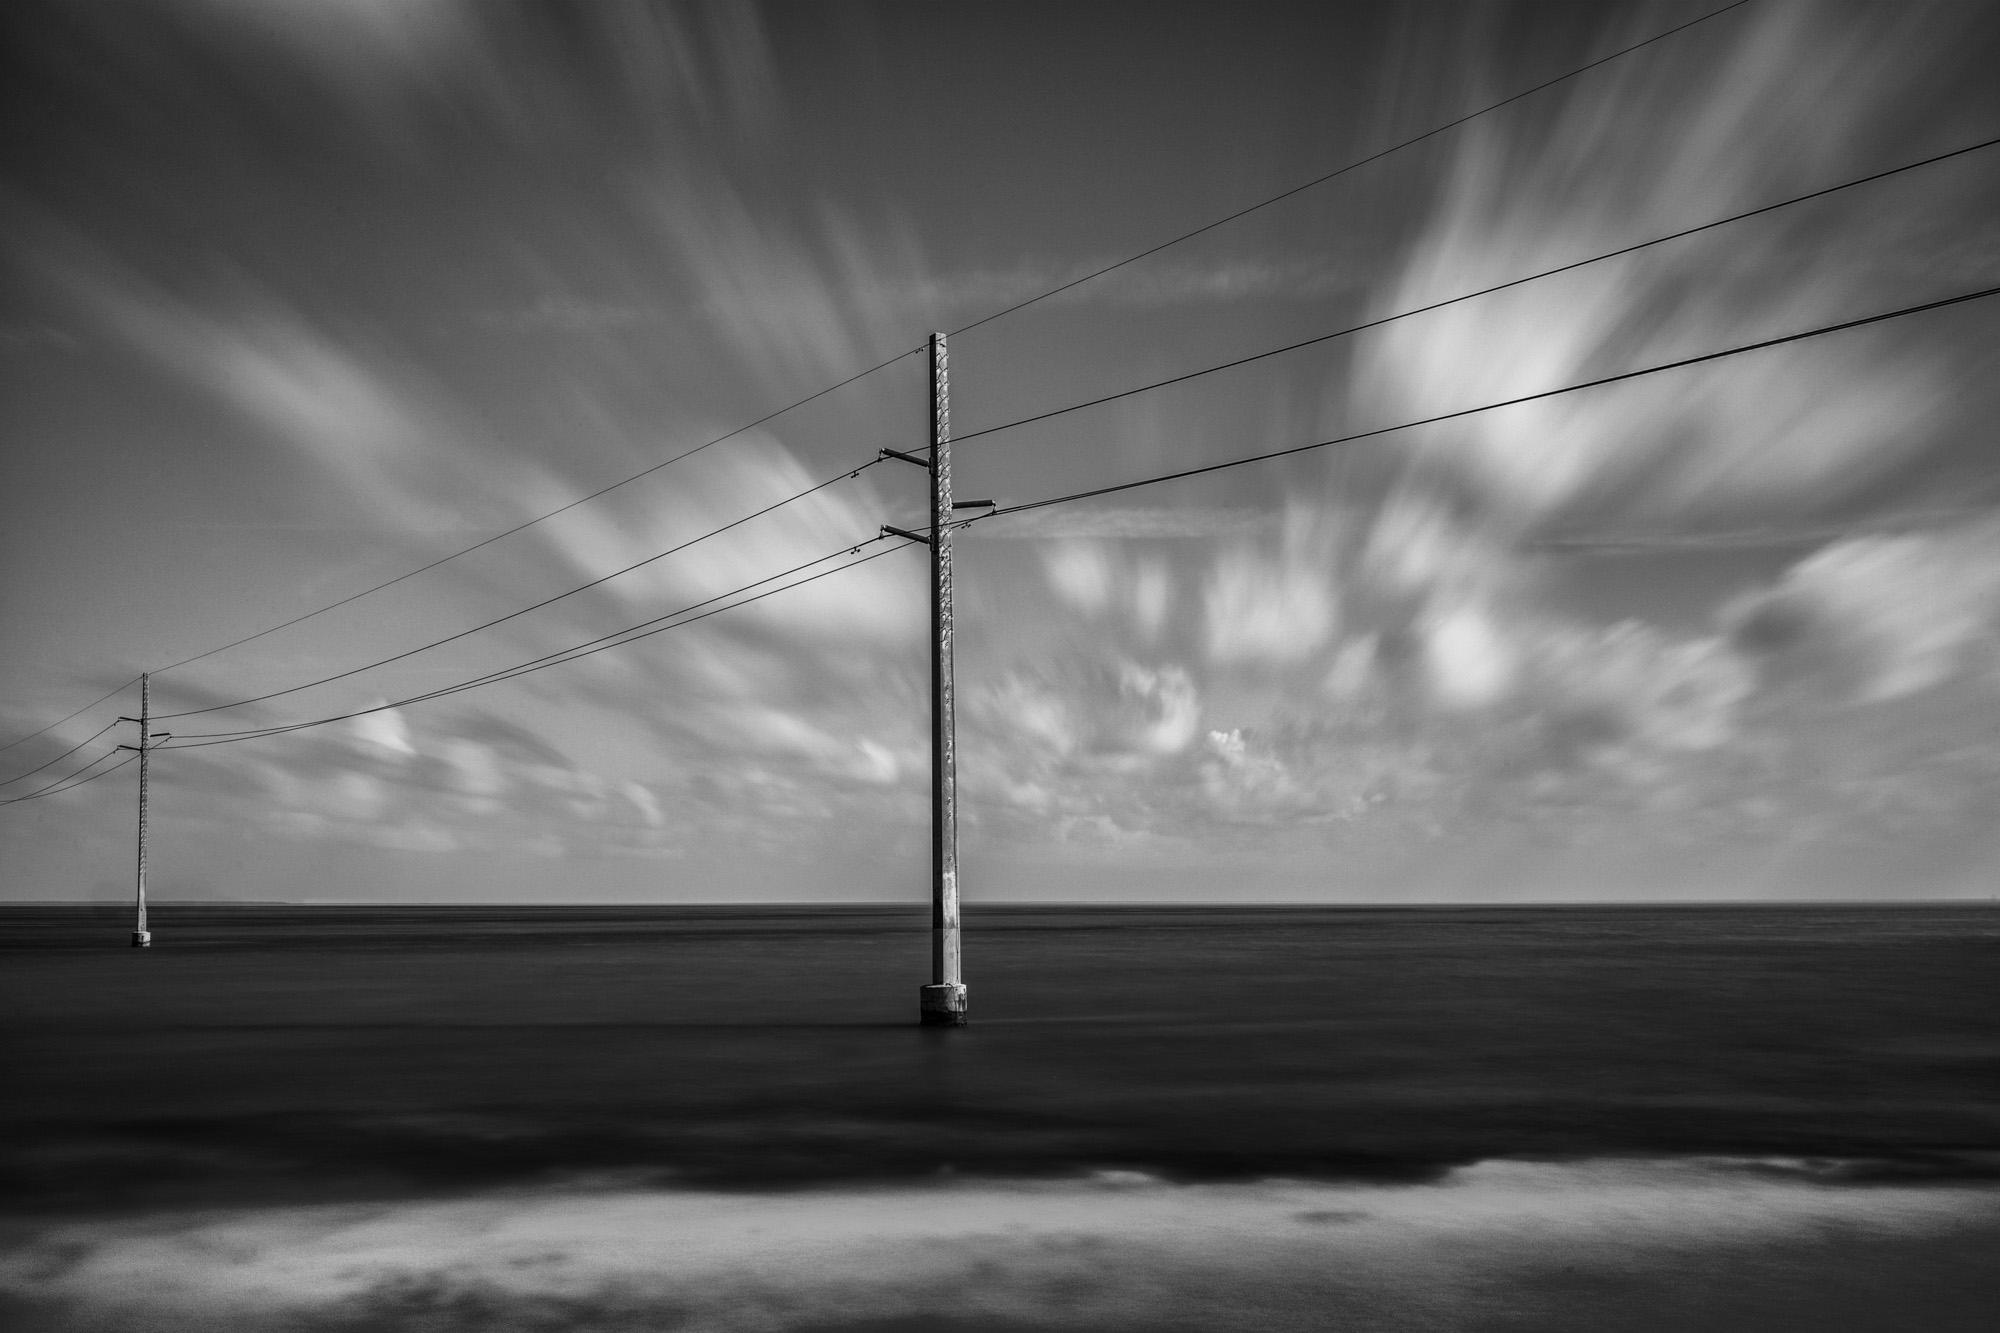 antonyz long exposure landscape photograph of telegraph posts in the ocean